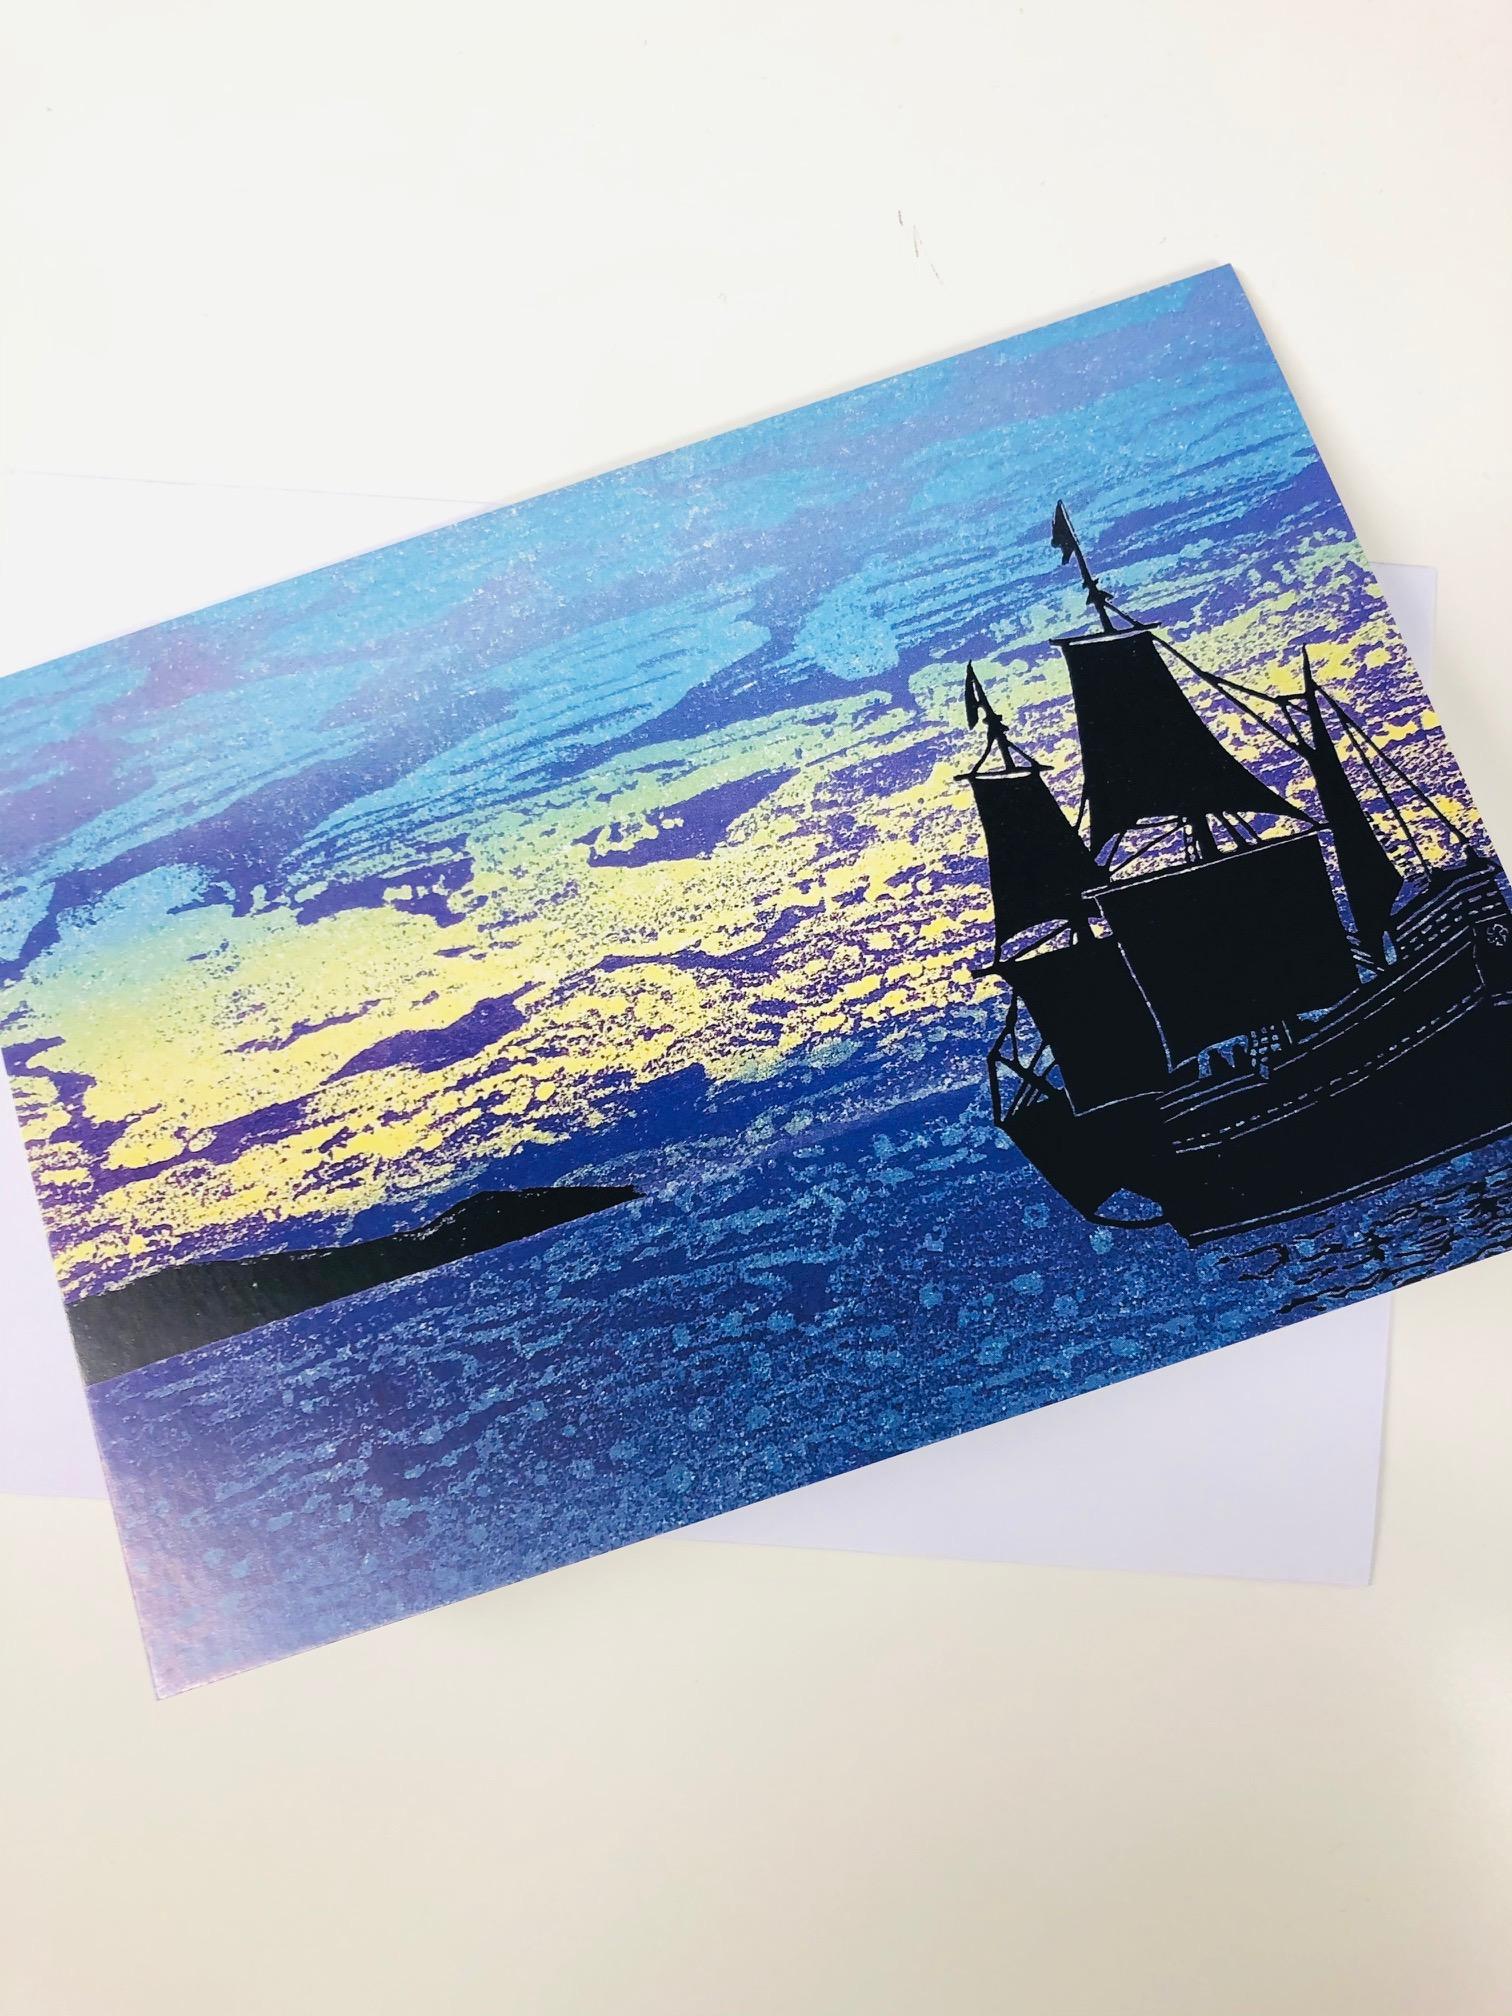 'Approaching Cod Bay' Greetings Card by Barbara Hamilton